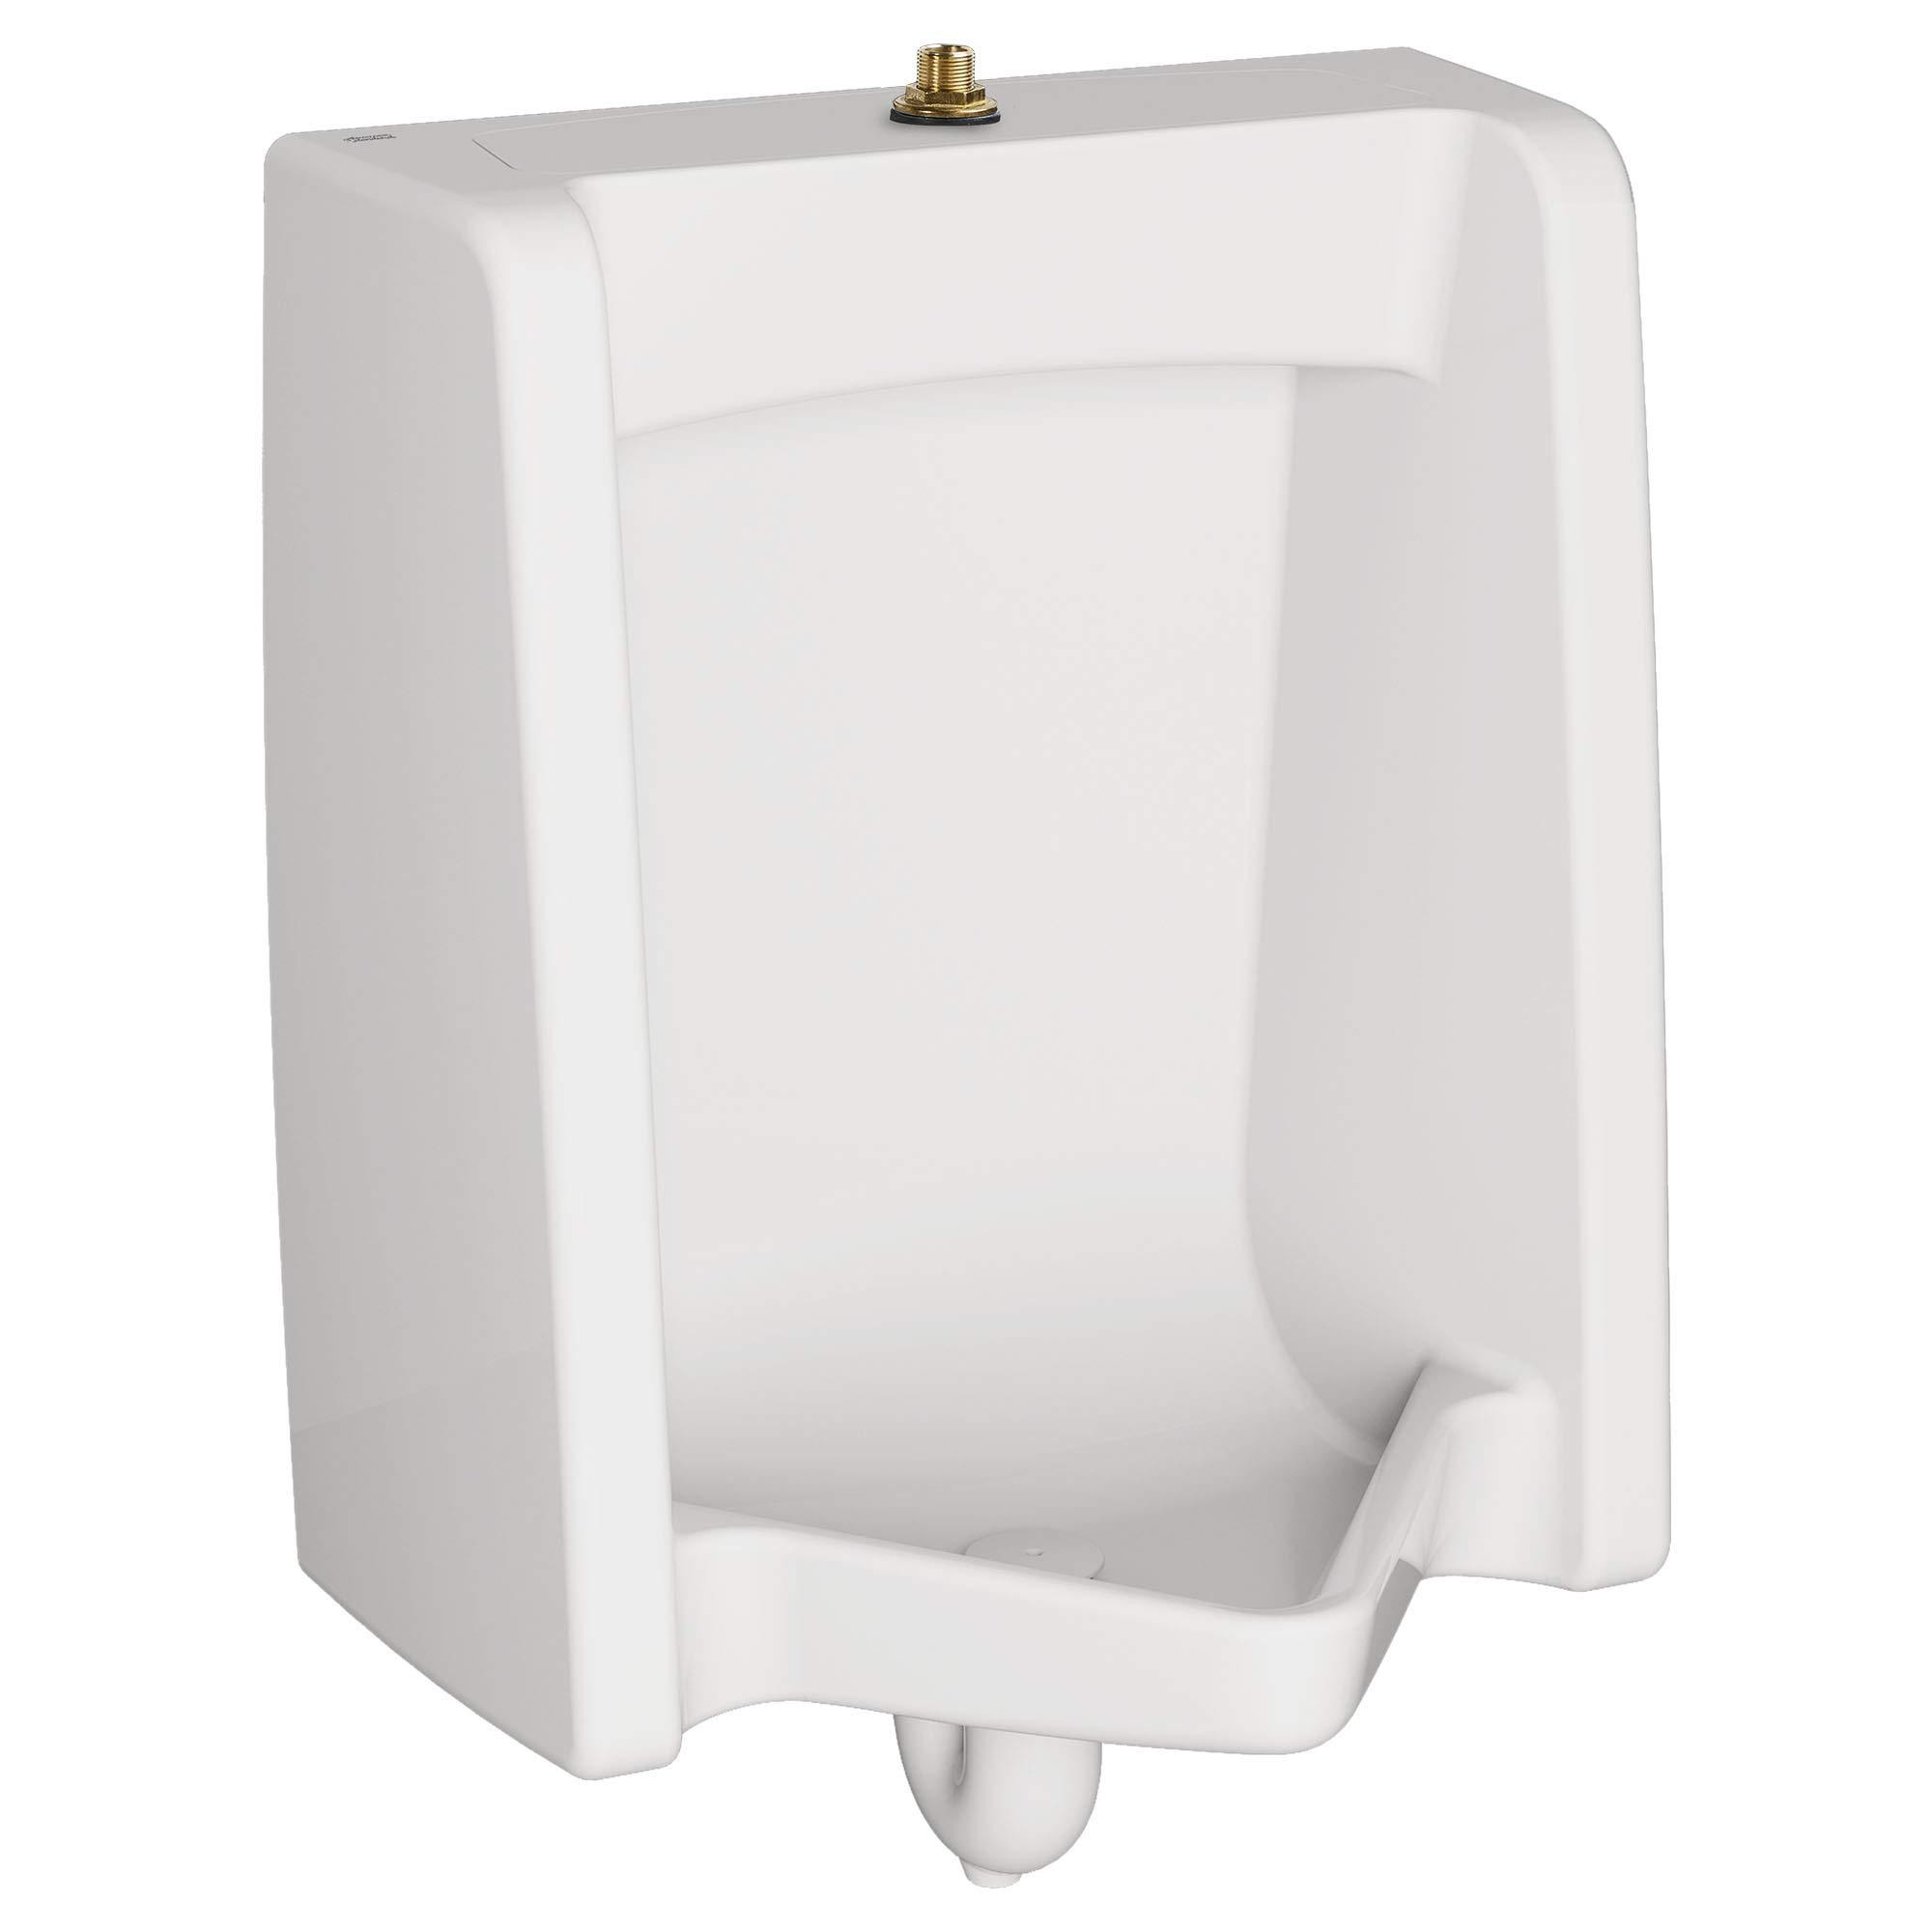 American Standard 6590.001.020 Washbrook FloWise Universal Urinal, White